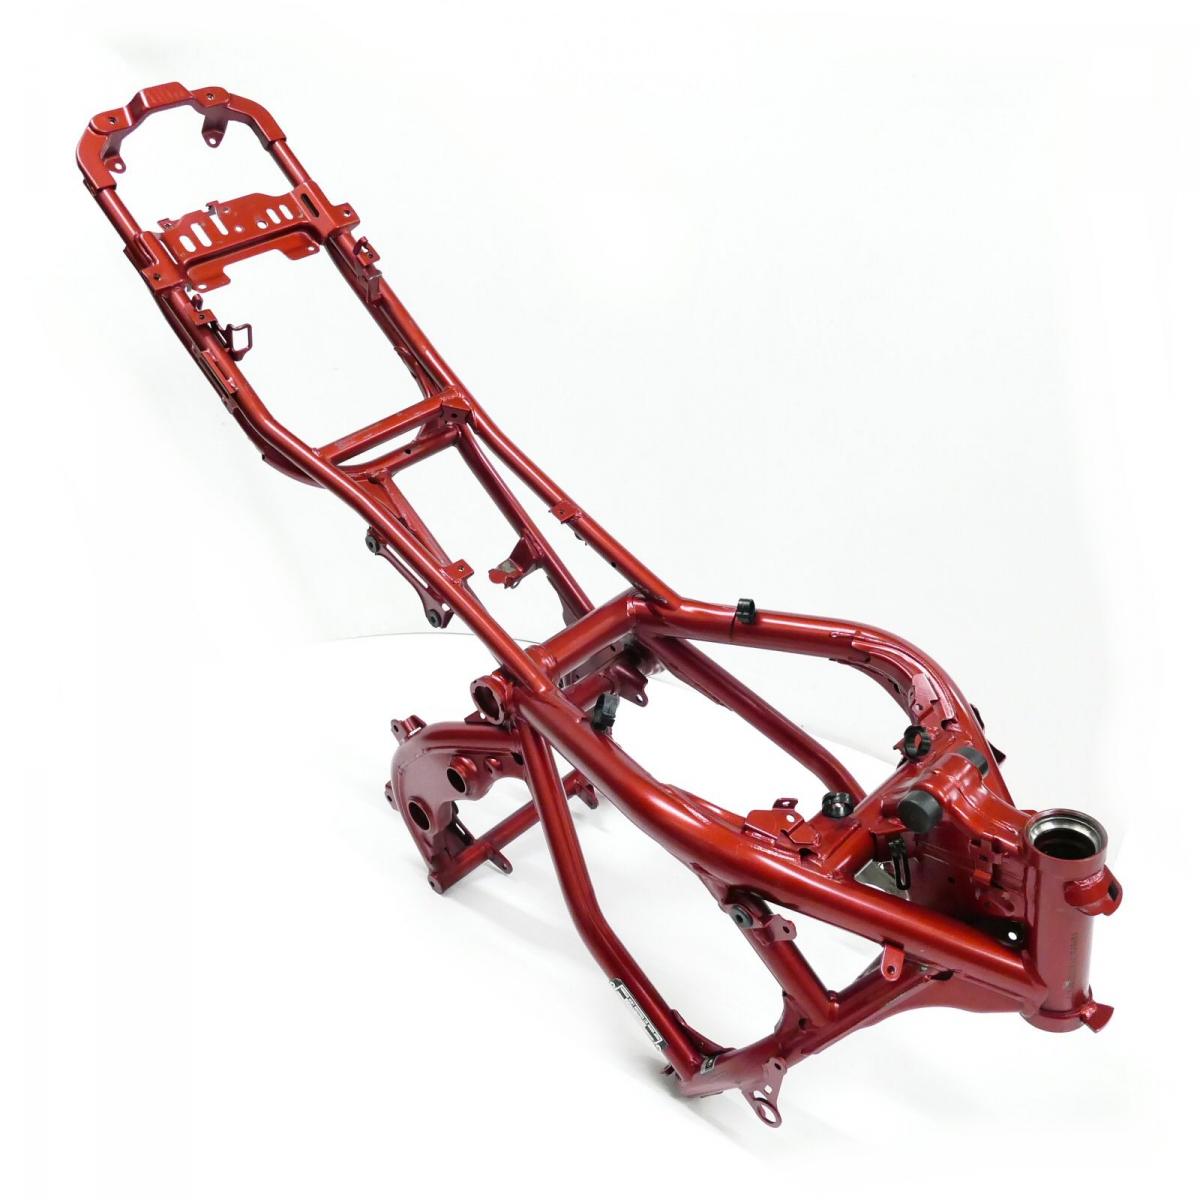 Kawasaki Er 6n Er6n Er650a Rahmen Hauptrahmen Bn Bikes 6f Wiring Harness Original Oe Abs 05 08